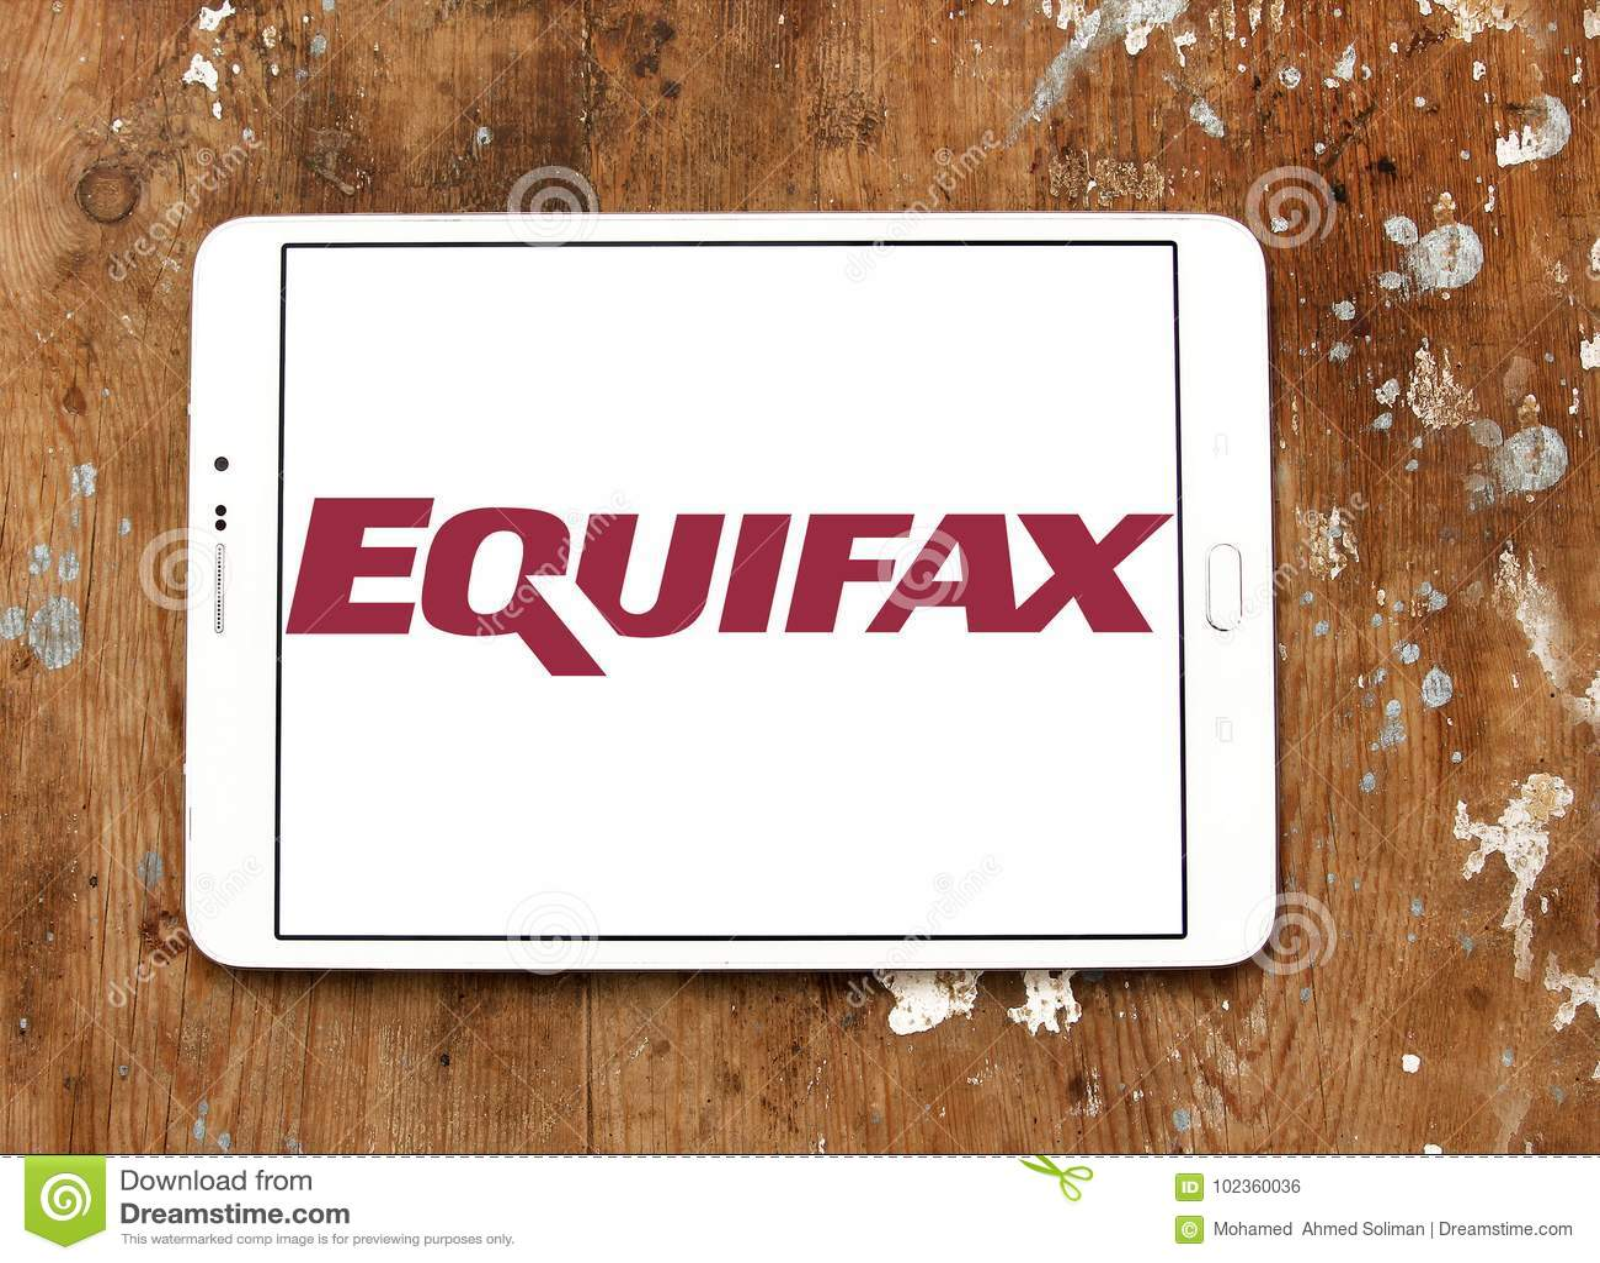 Equifax company logo